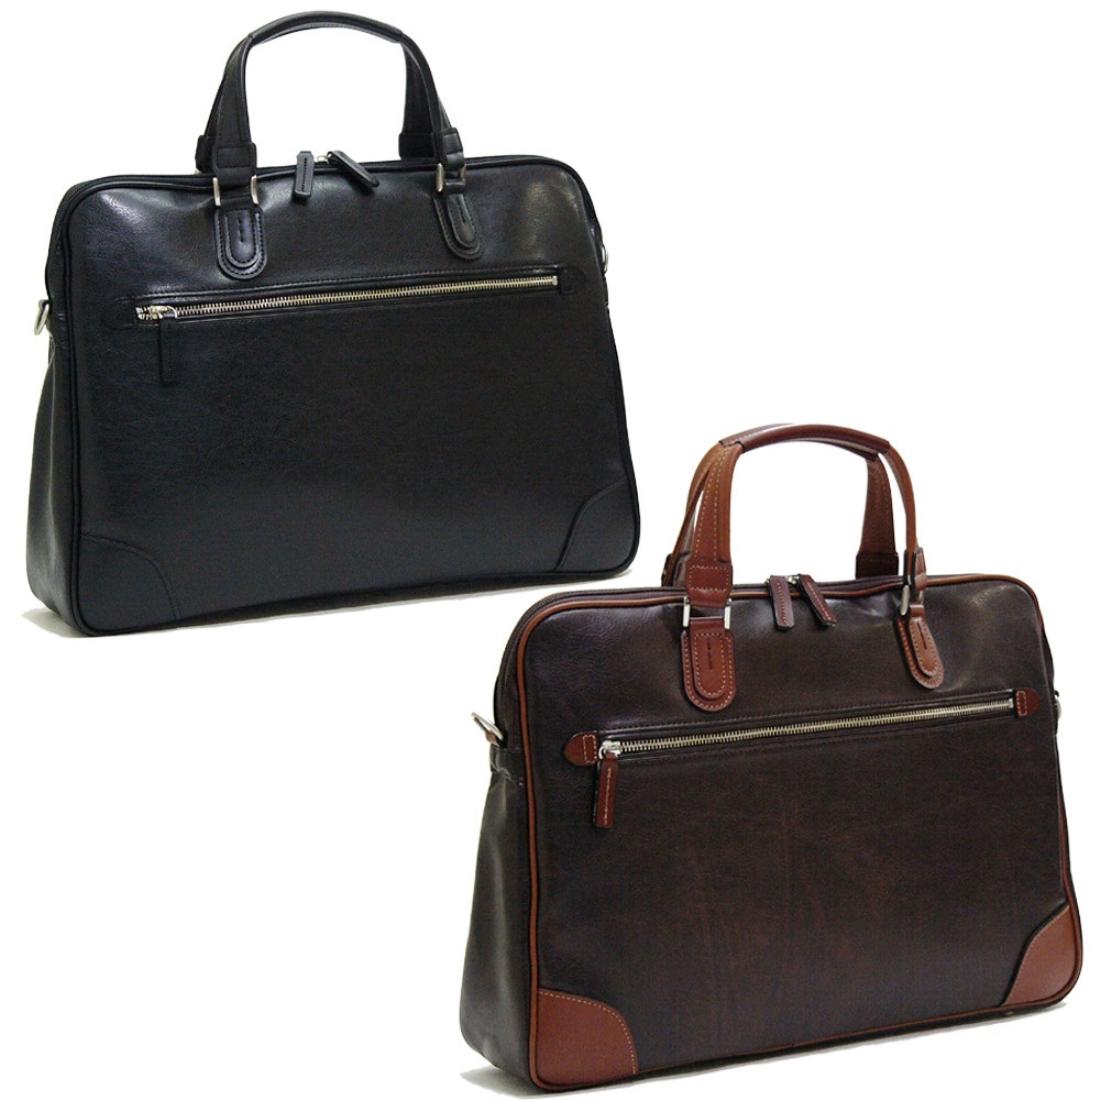 V.S.細マチビジネス 仕事 バグ チョコ 日本製日本 ビジネス 仕事 バッグ 鞄 付属/本革